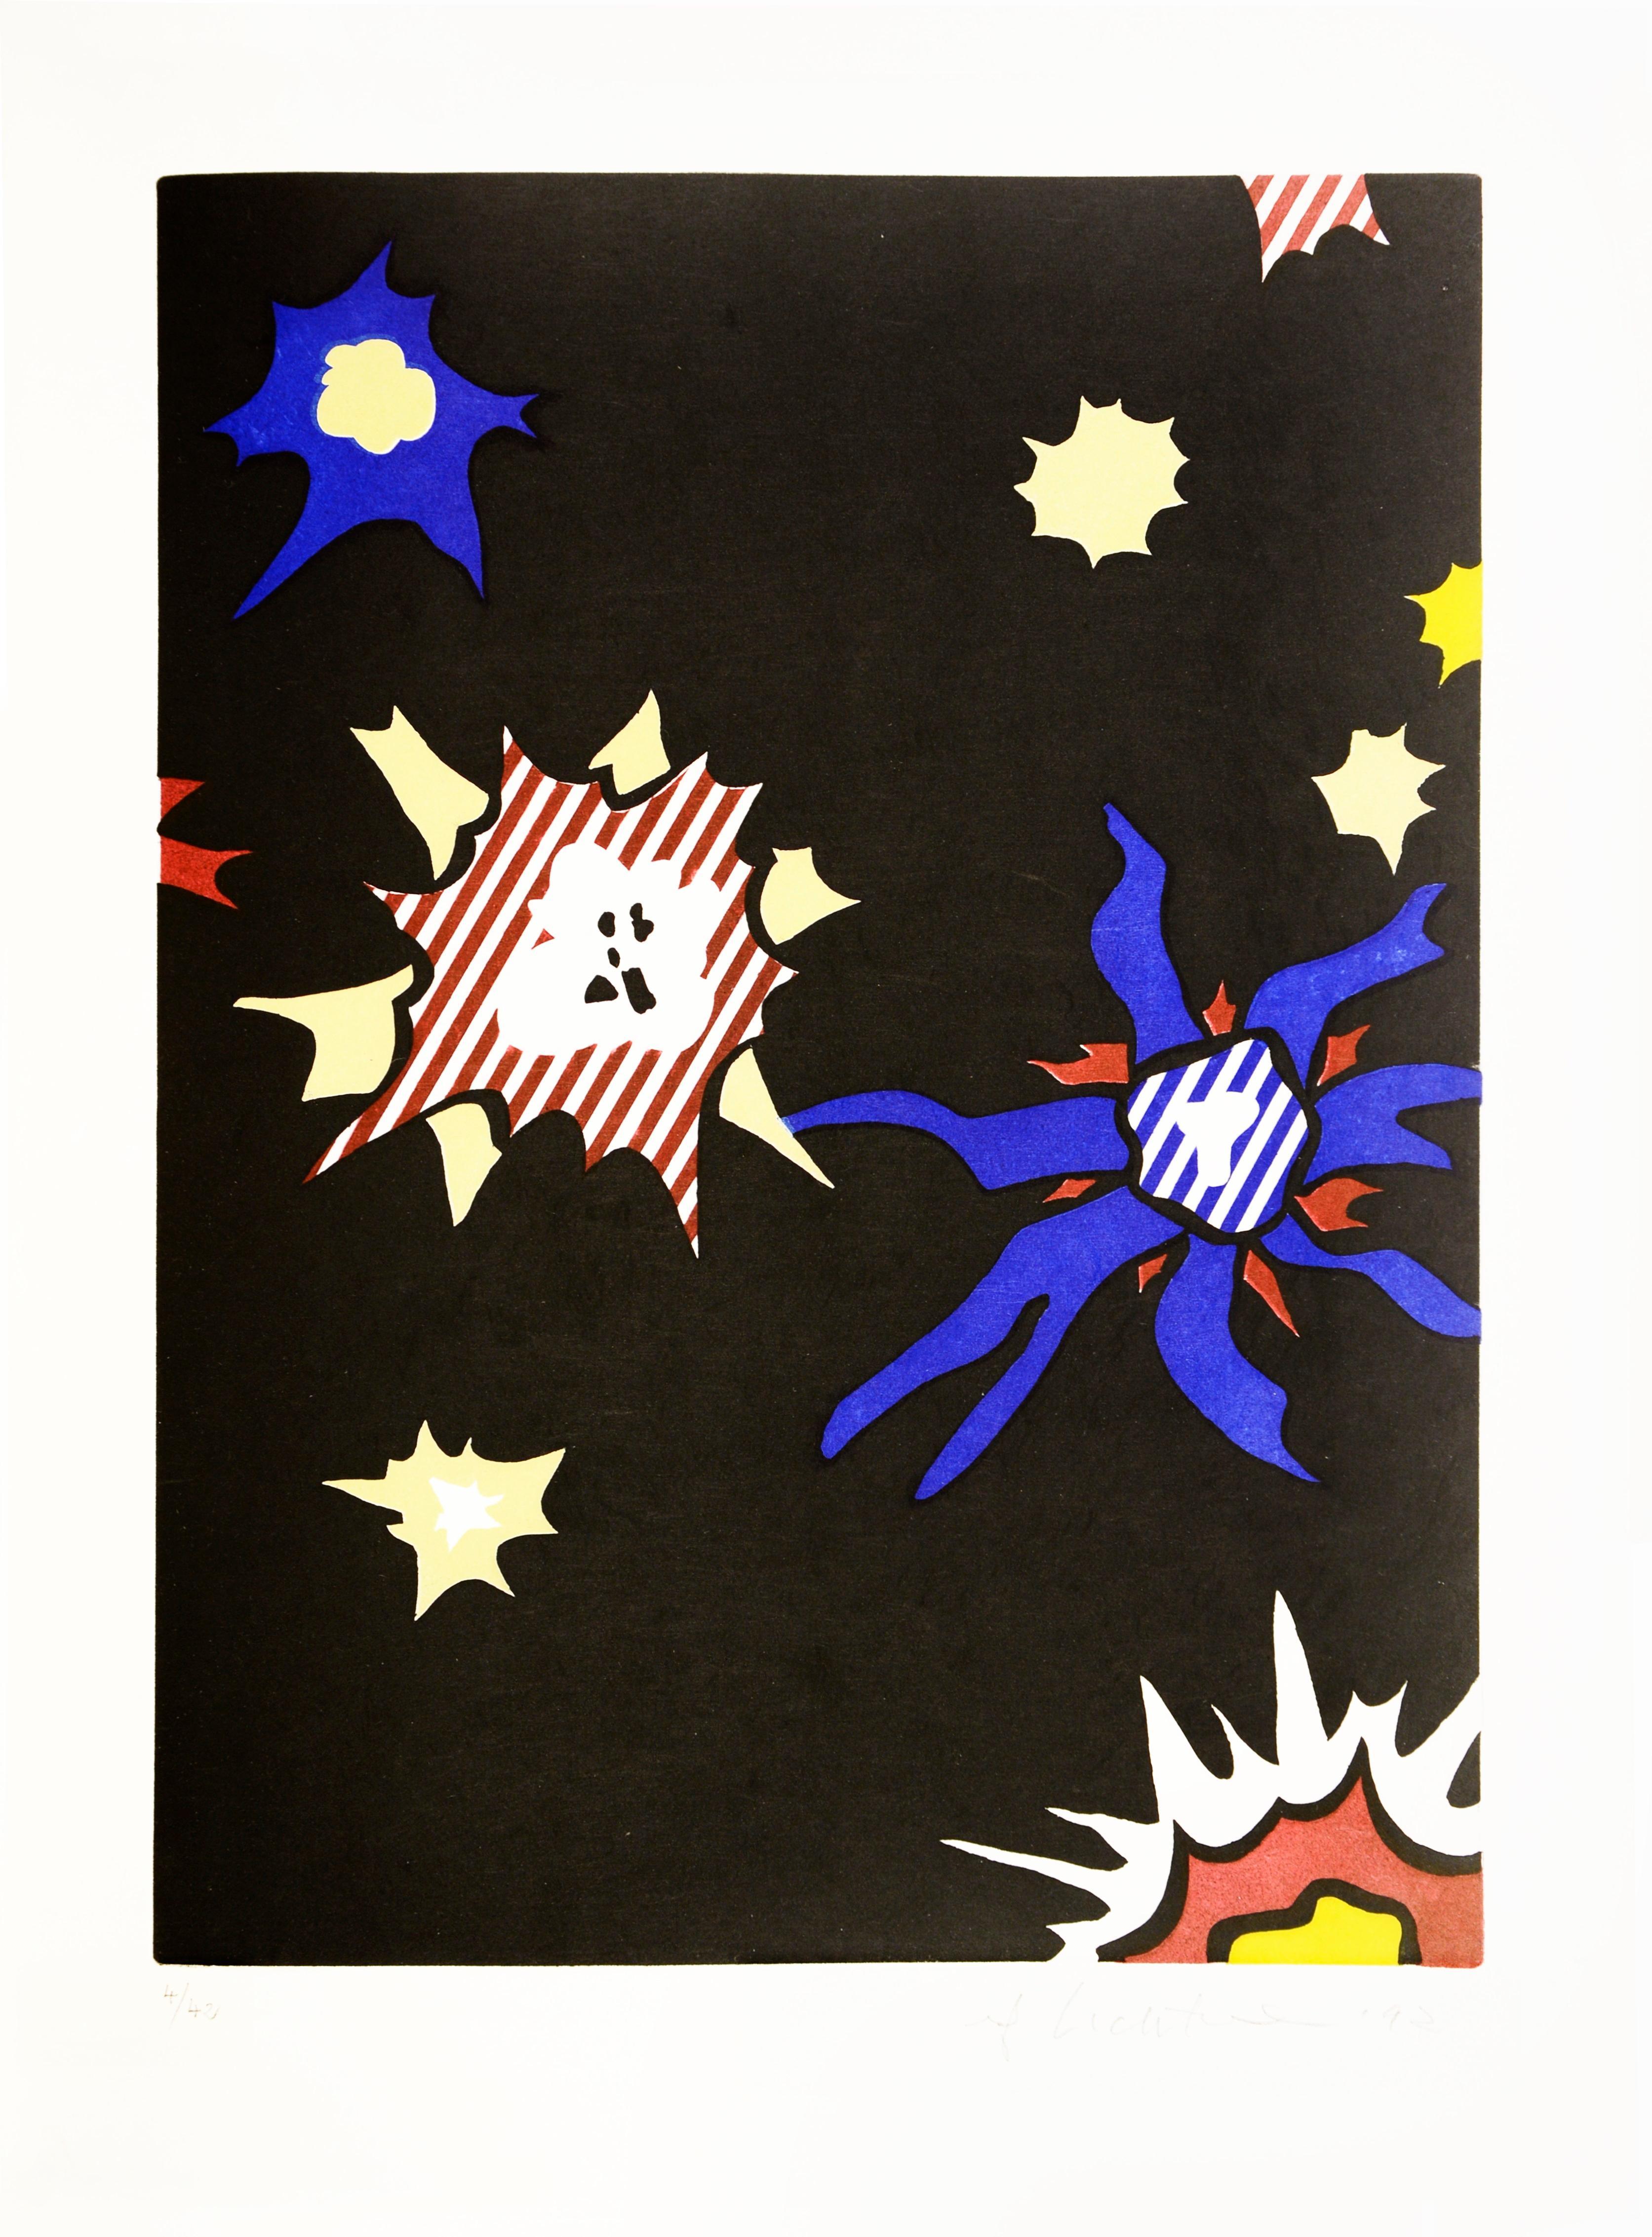 Lichtenstein, Hüm-Bum!', from The New Fall of America